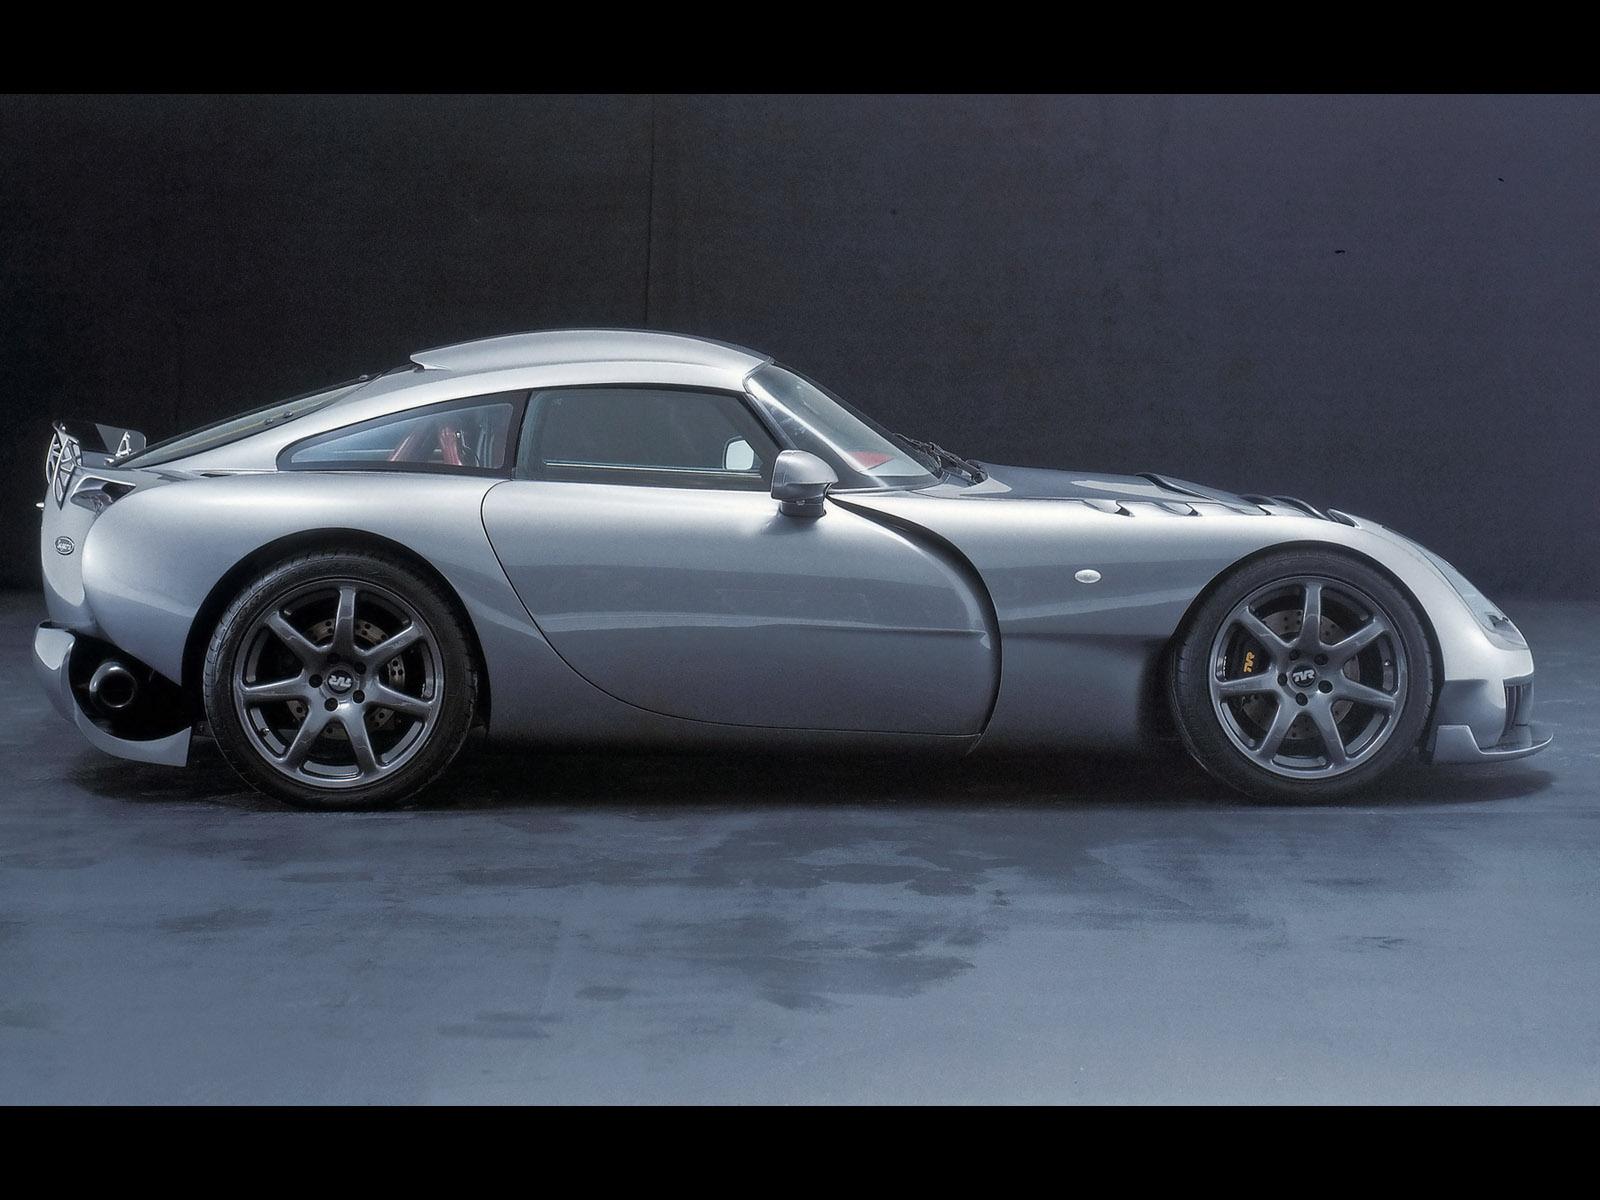 Wallpapers of beautiful cars: - 227.5KB